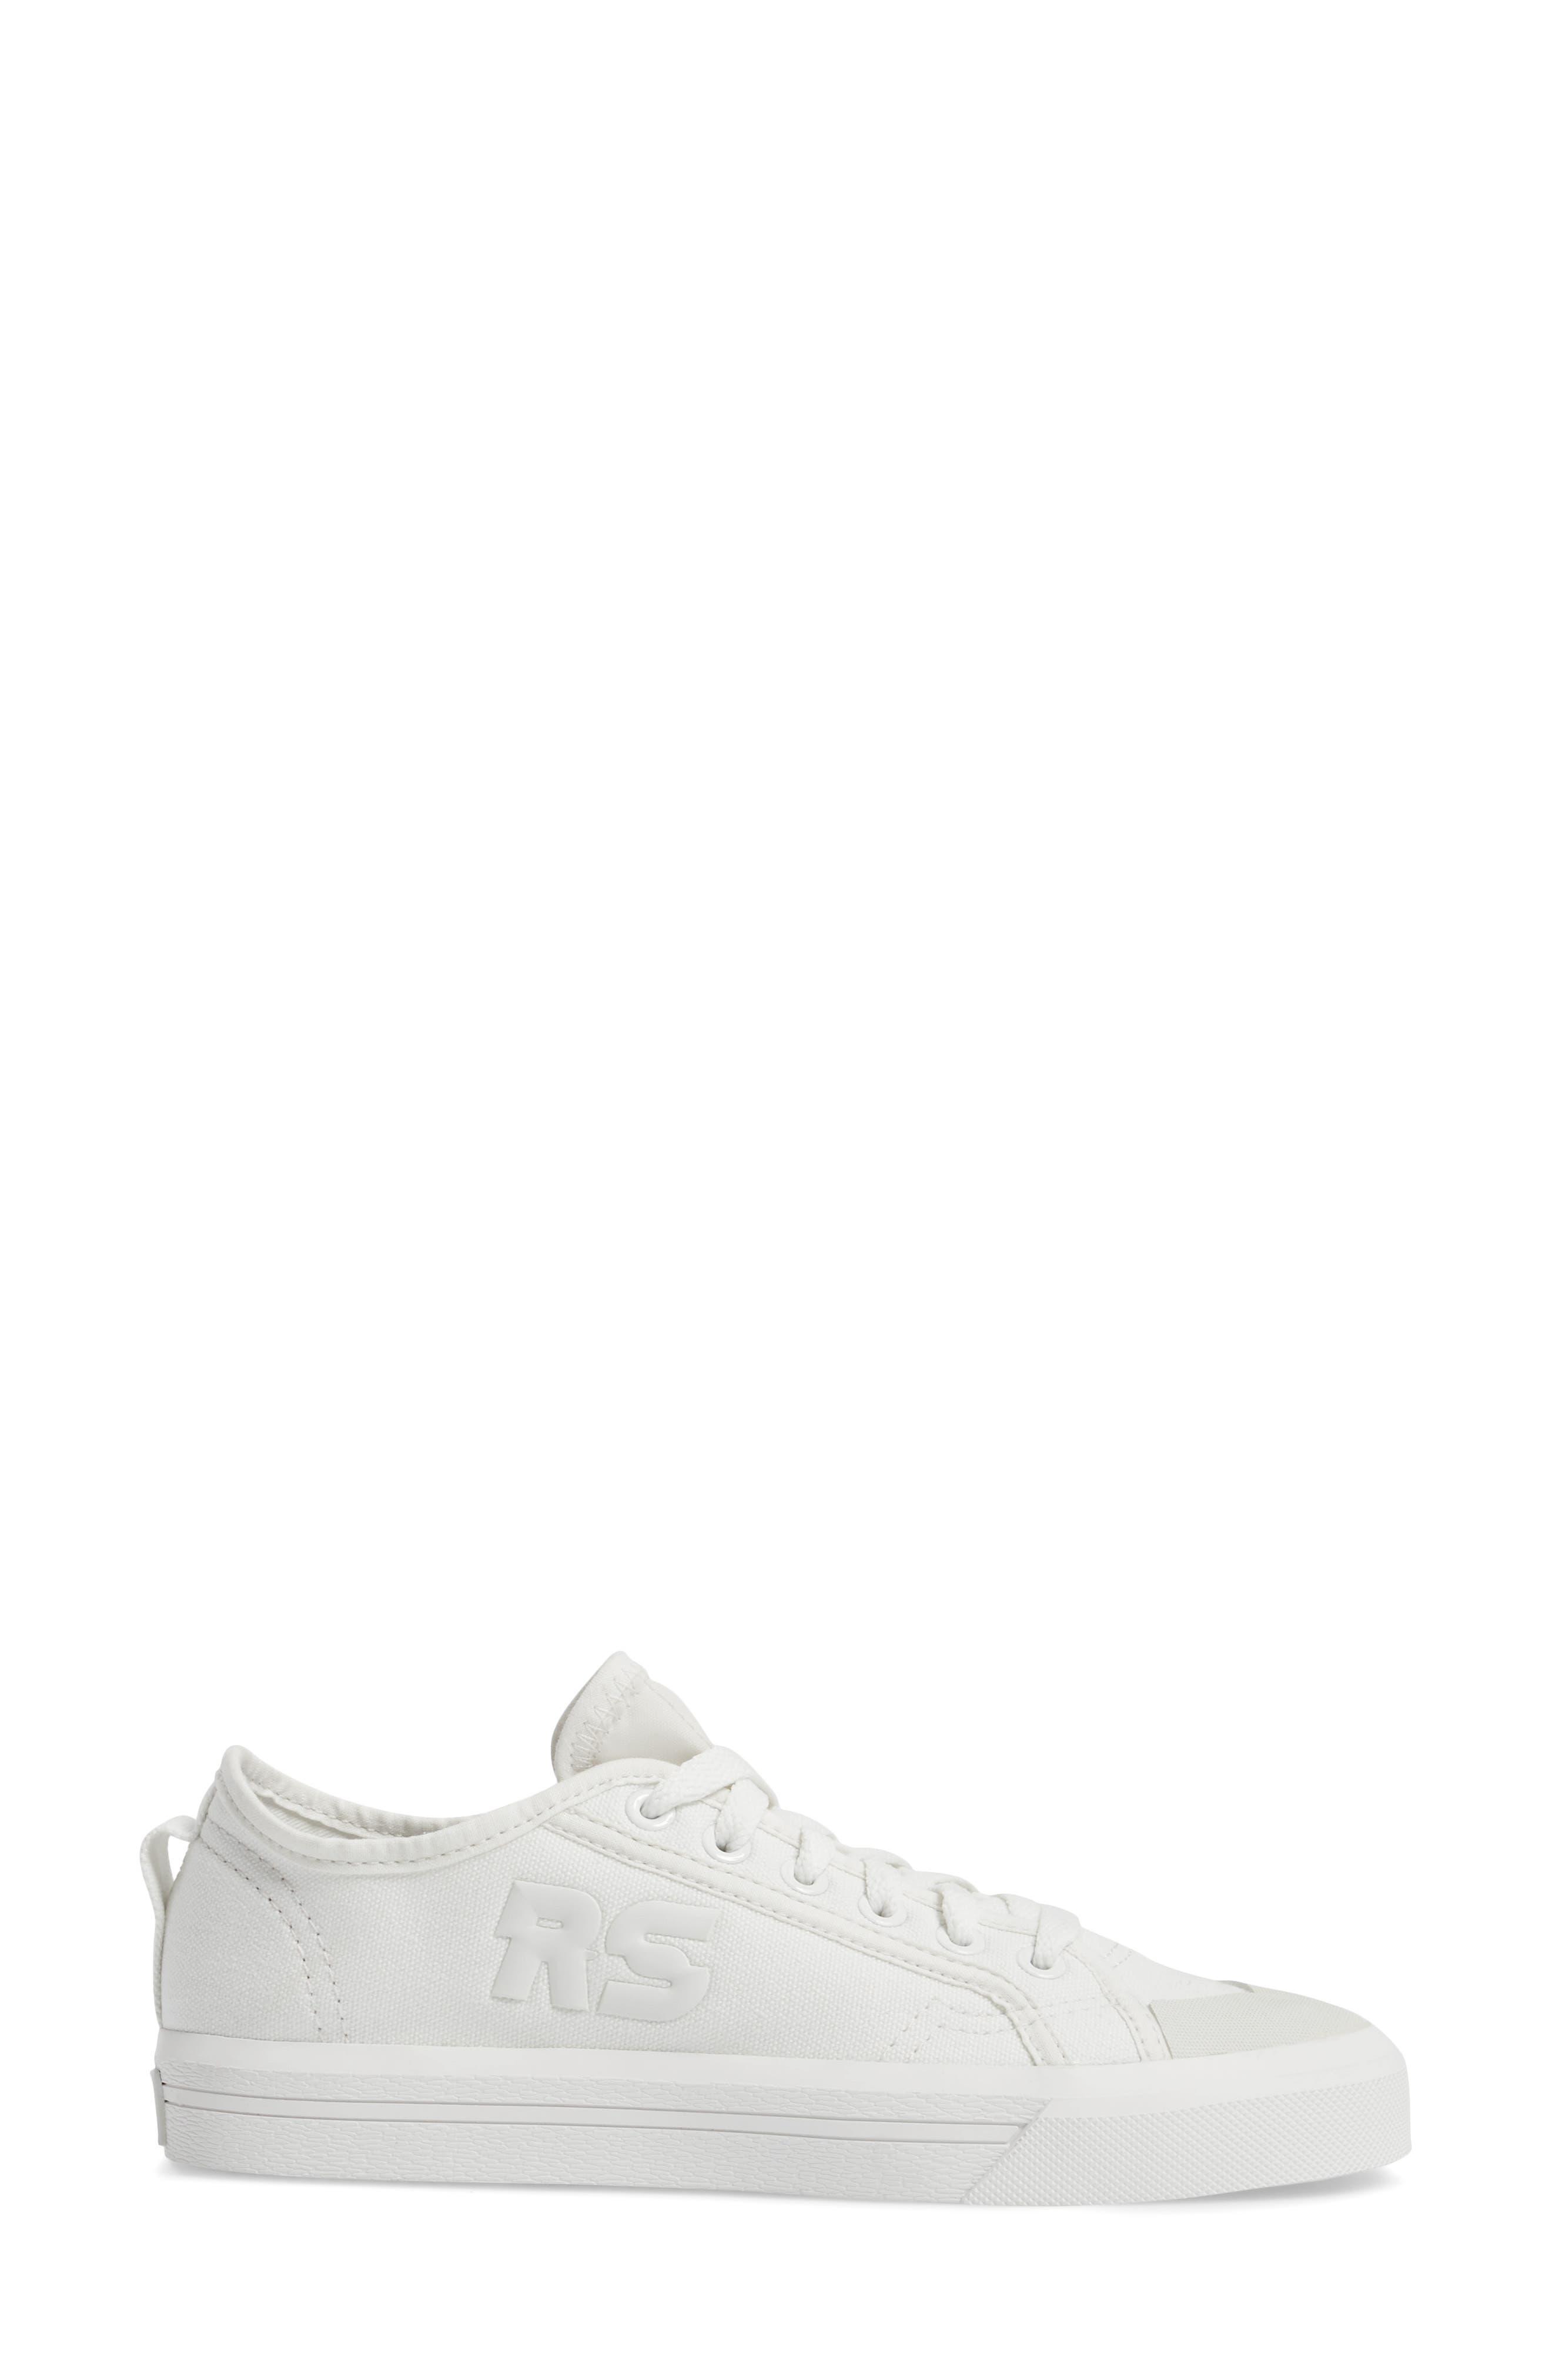 adidas by Raf Simons Spirit Low Top Sneaker,                             Alternate thumbnail 6, color,